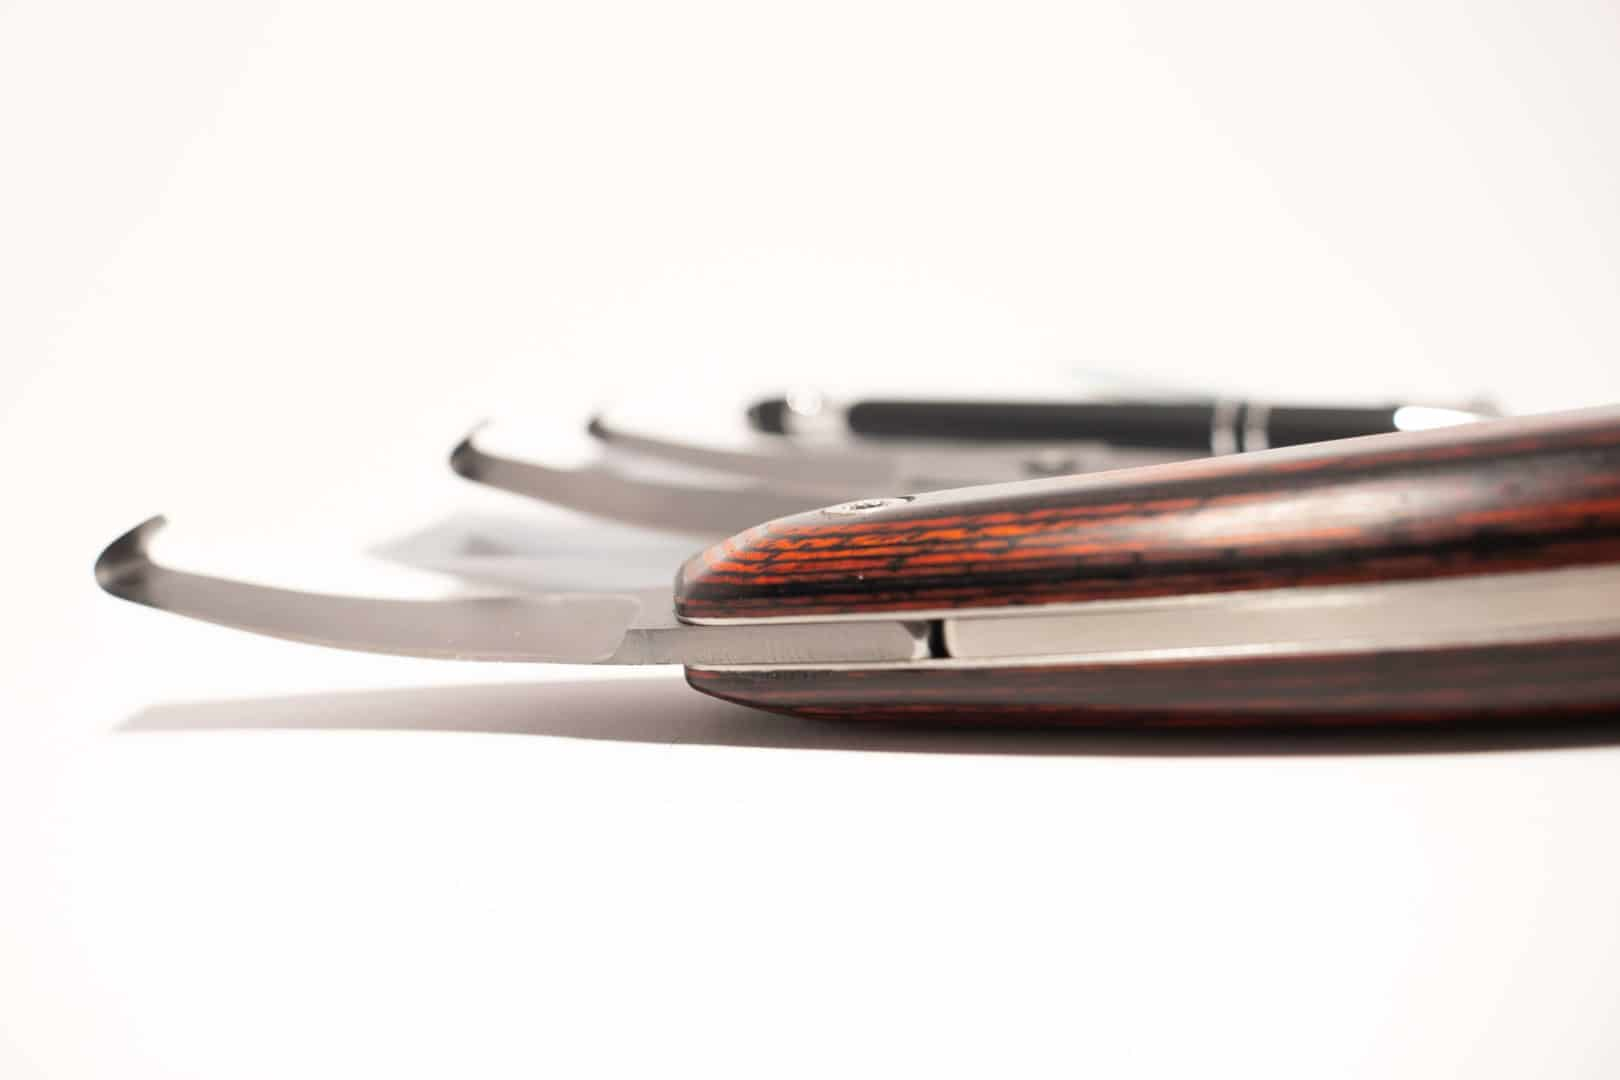 Luwex Straight Blade Set - Blade Close Up